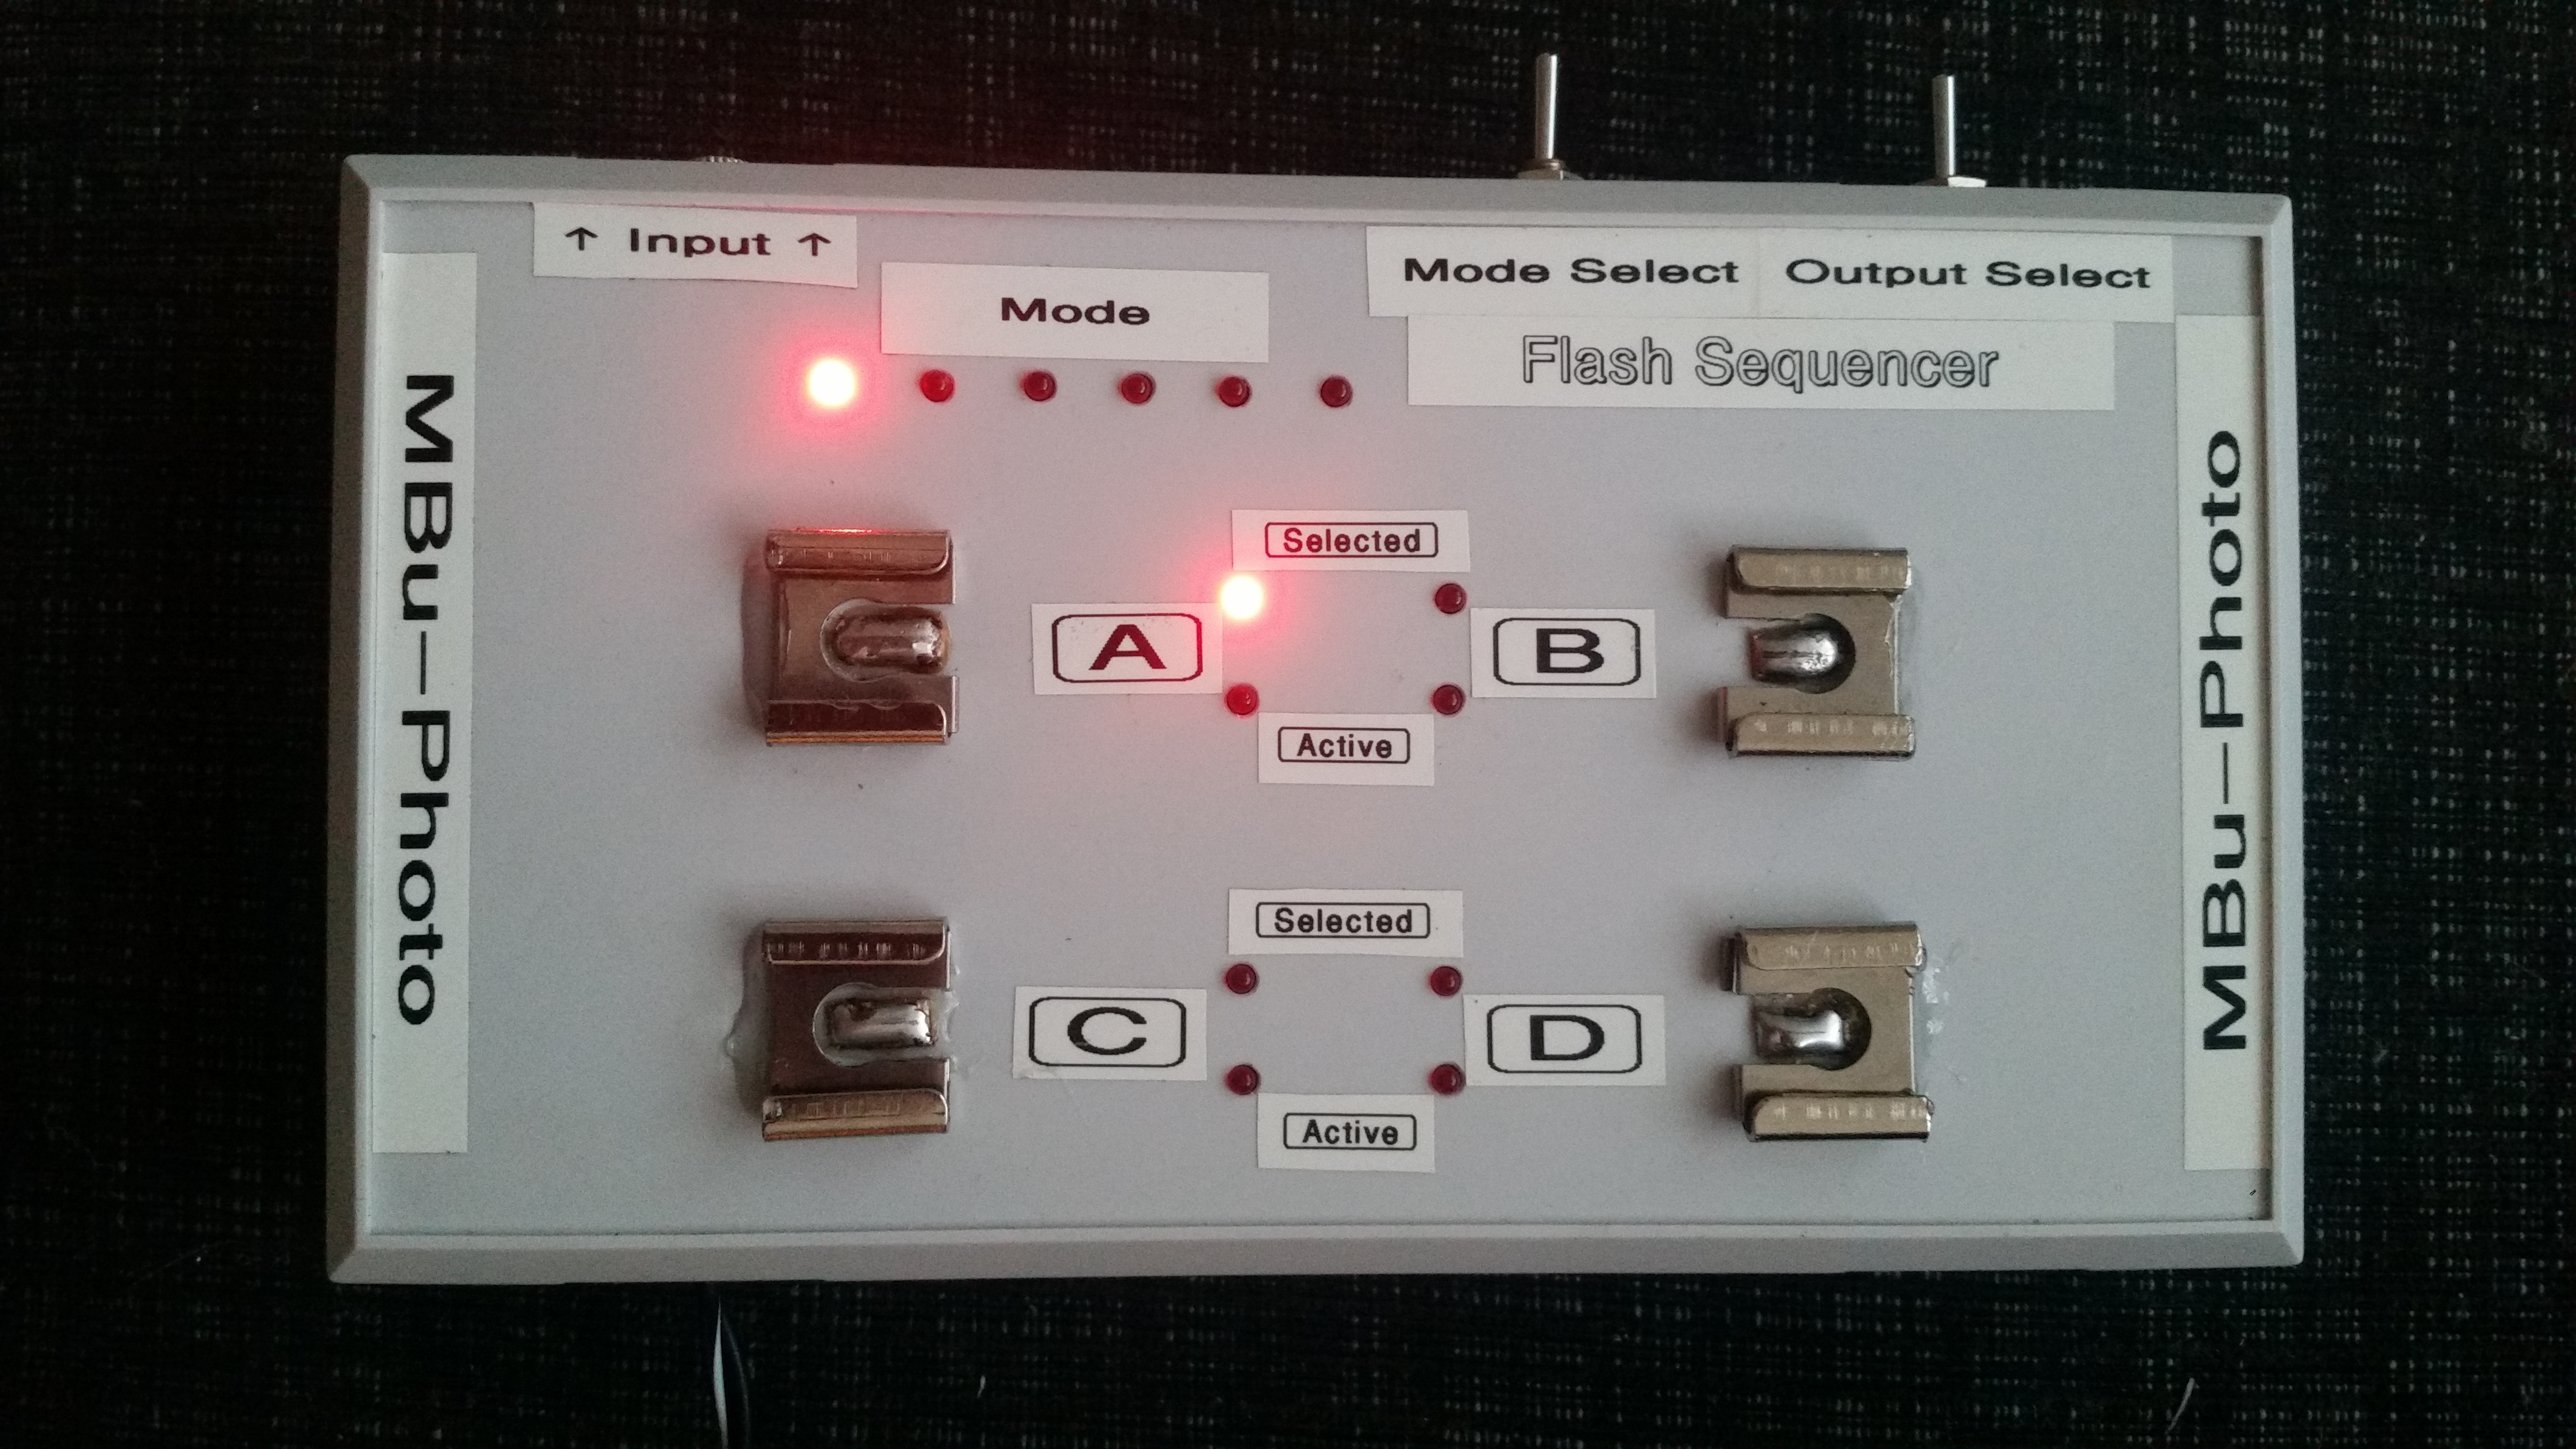 Flash Sequencer